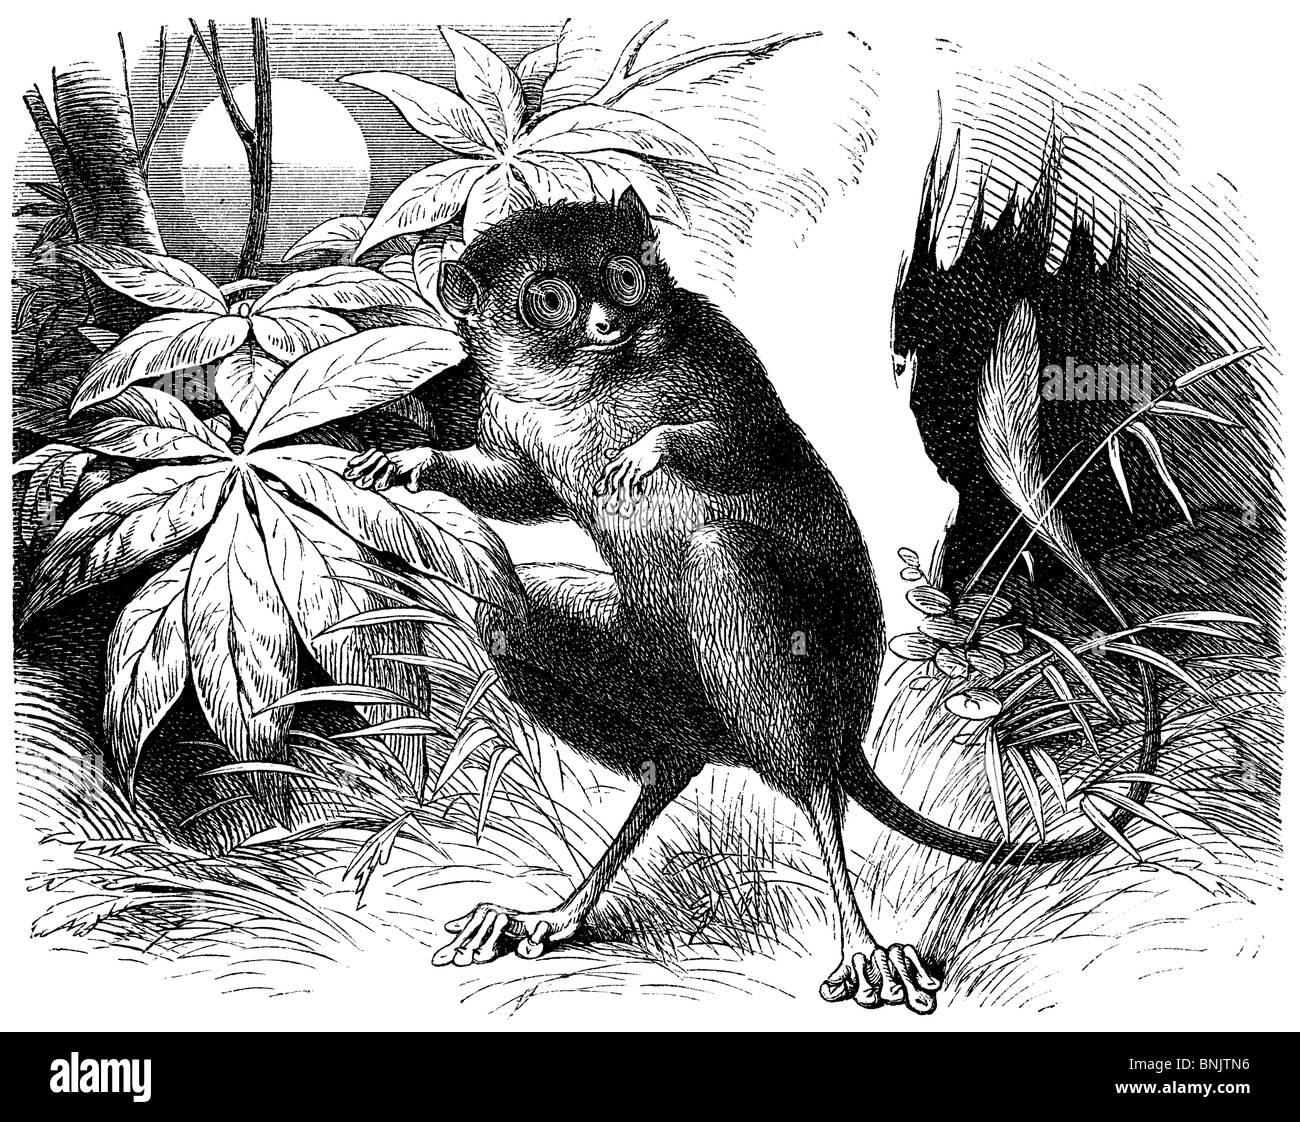 Sulawesi tarsier, Spectral tarsier, Tarsius spectrum - Stock Image